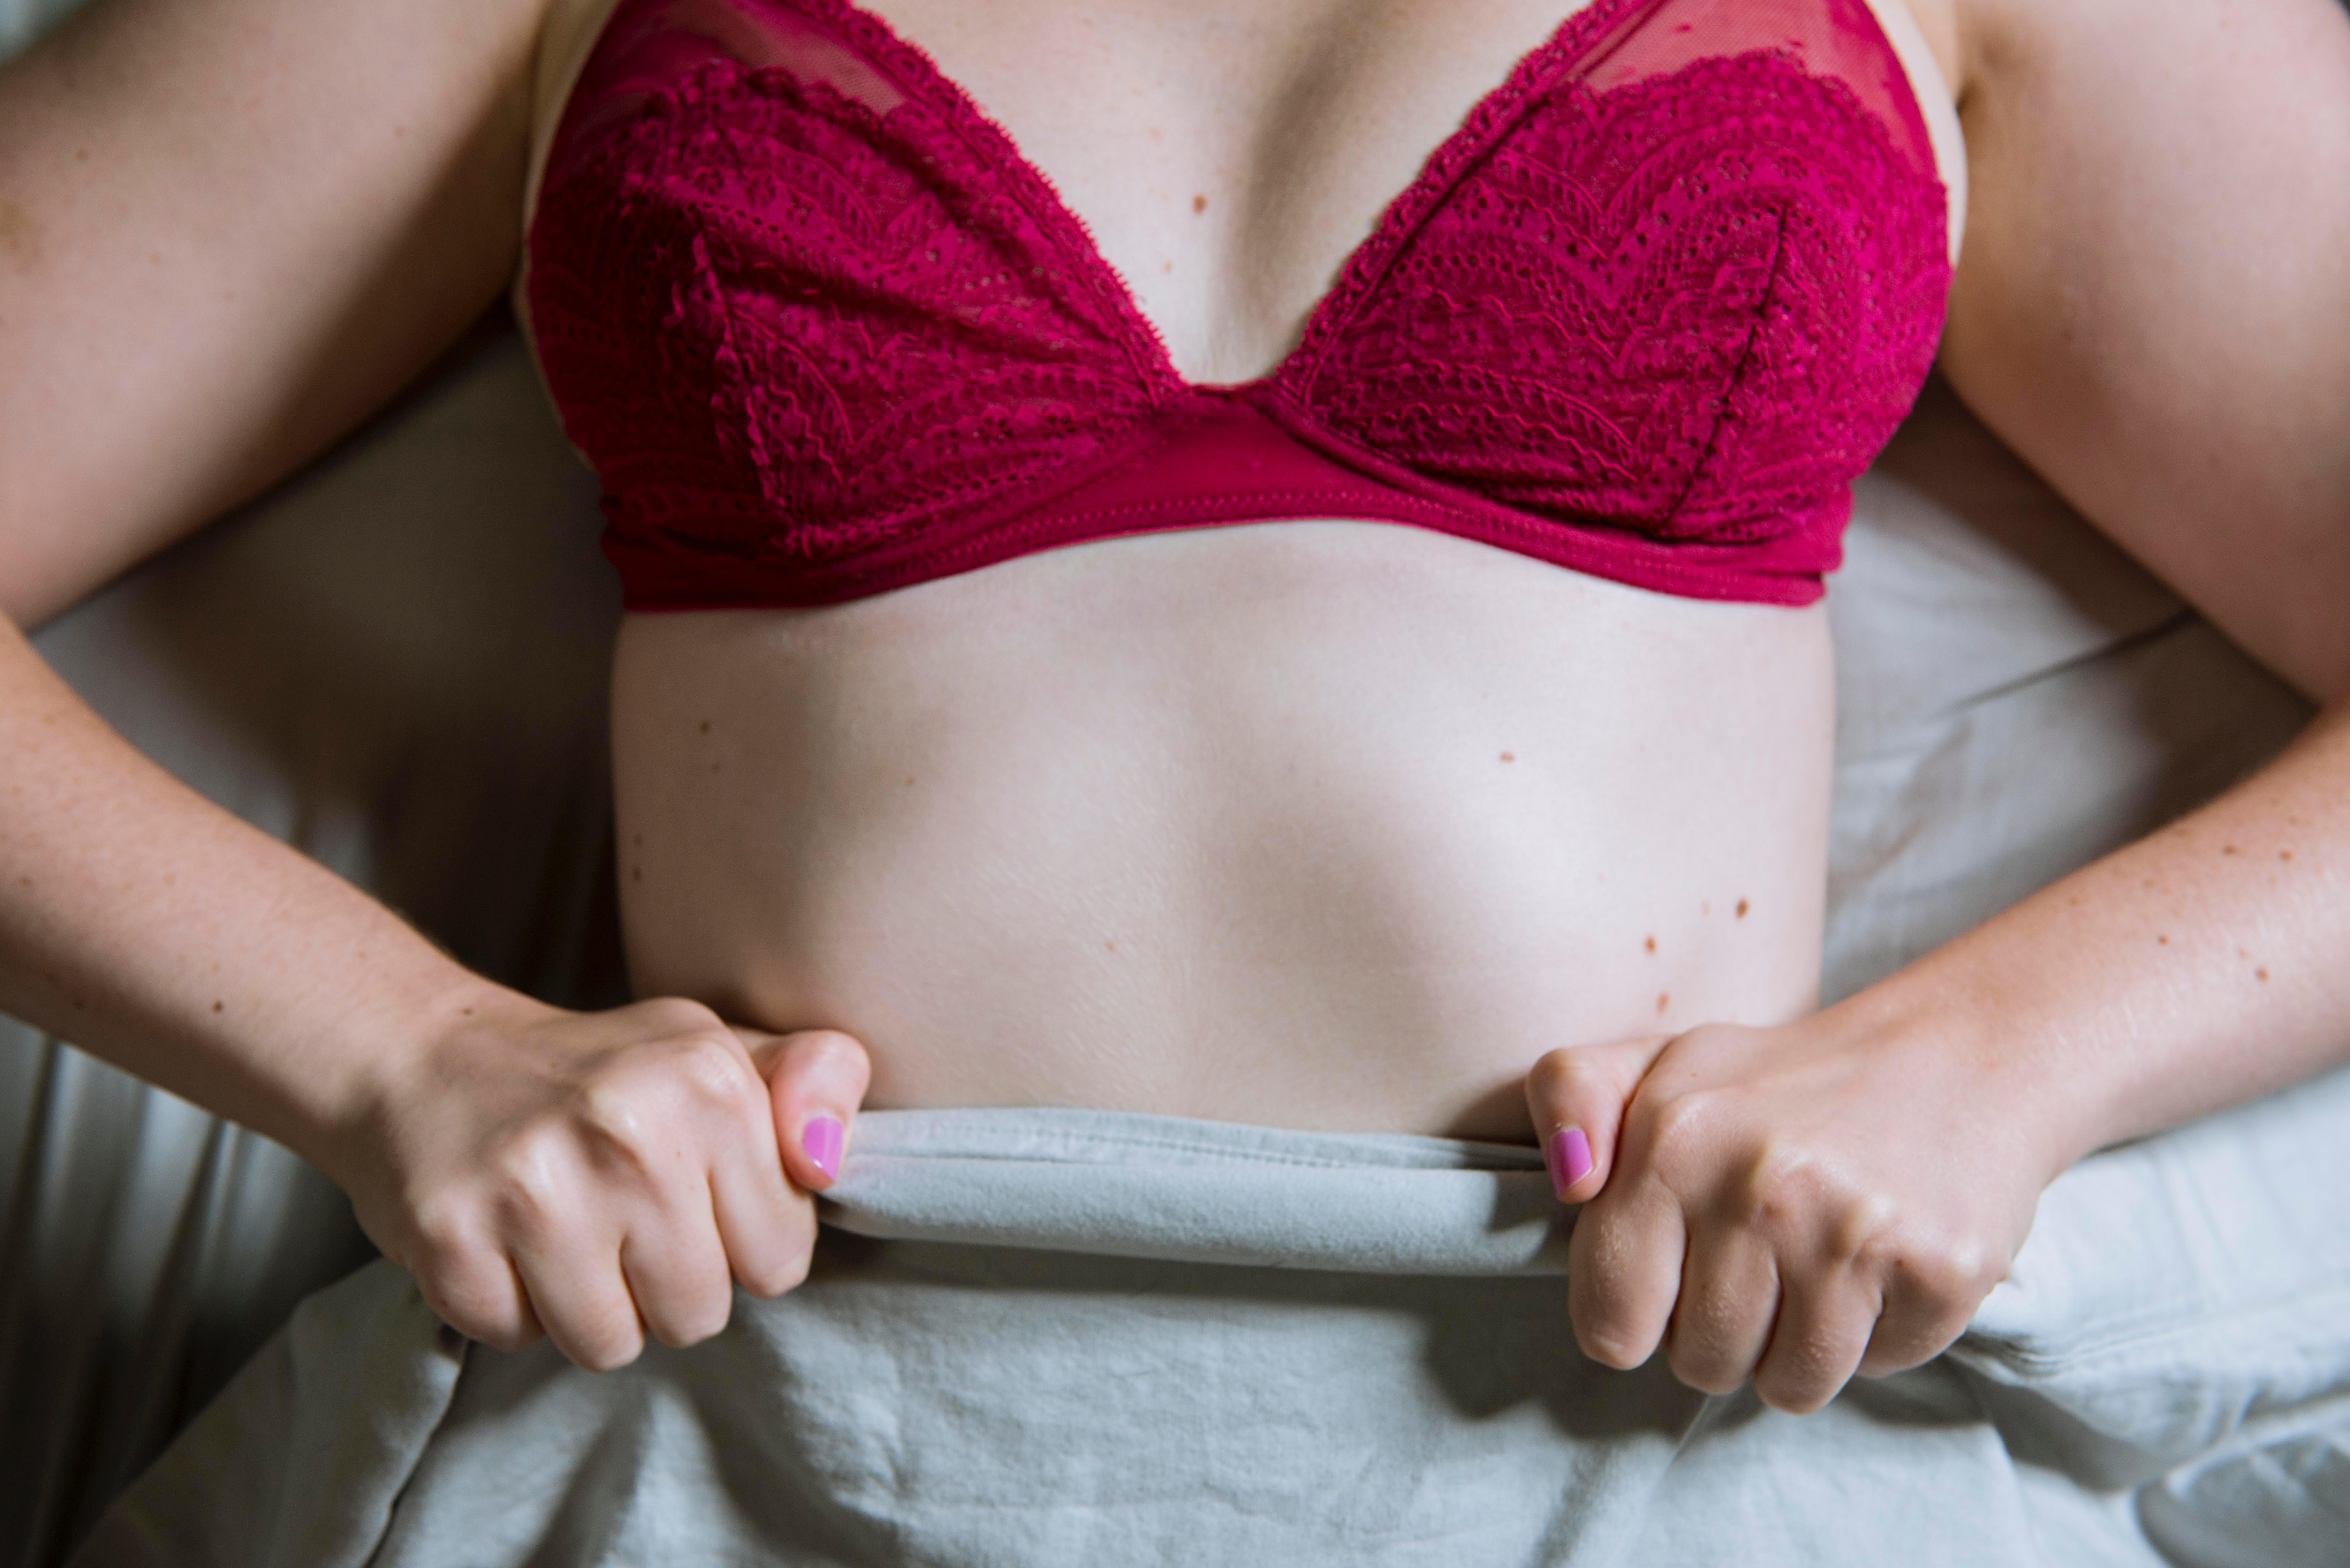 Mature pantyhose sex with boys